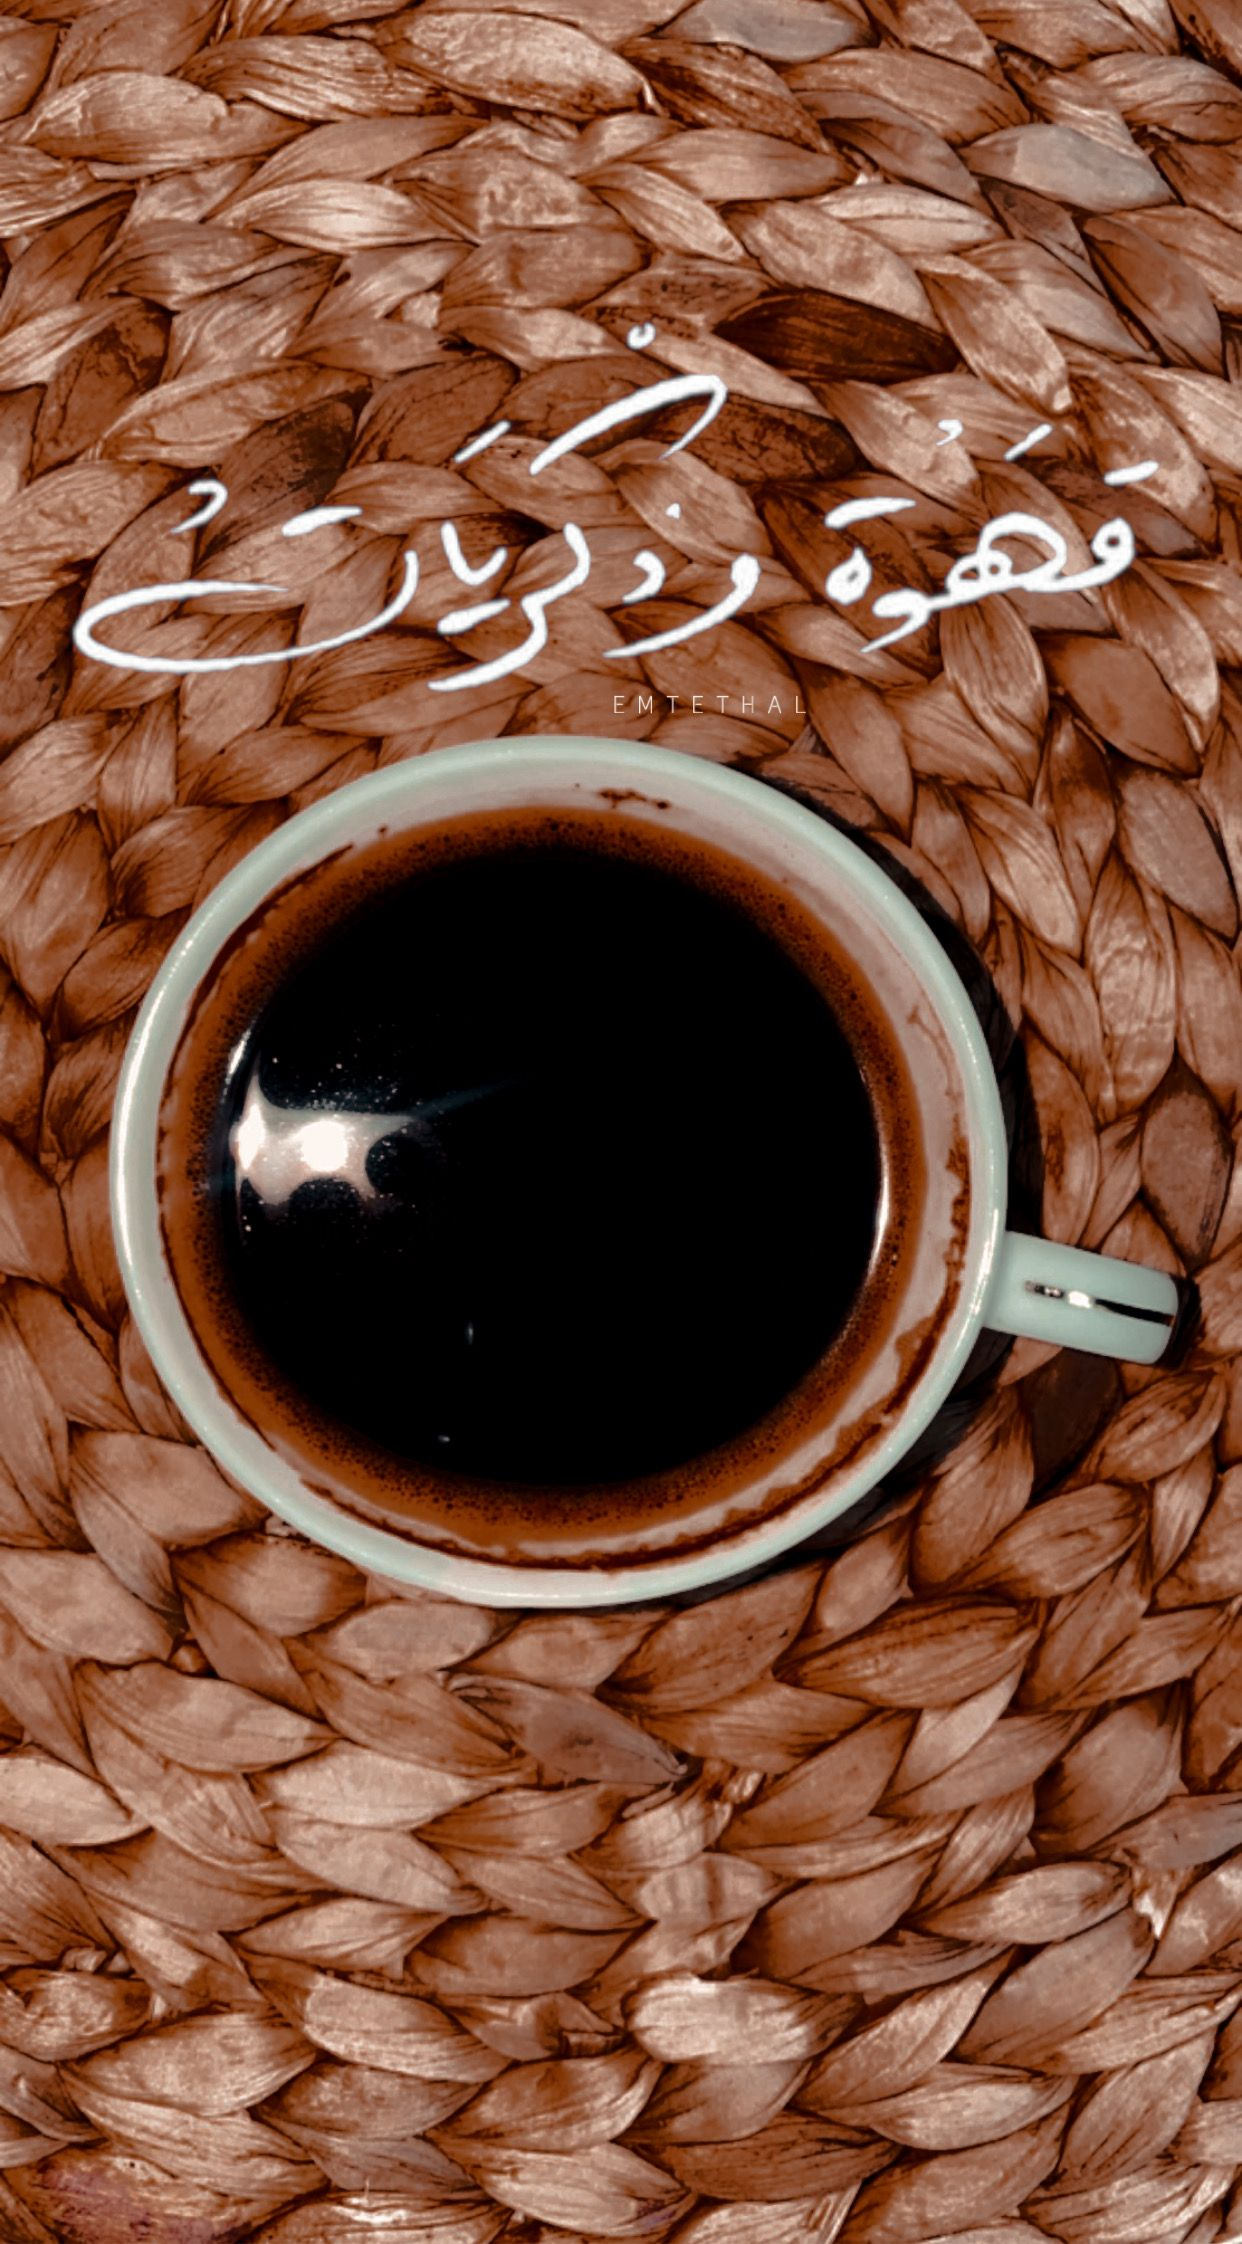 قهوة وذكريات Coffee Recipes Iphone Wallpaper Quotes Love Tableware